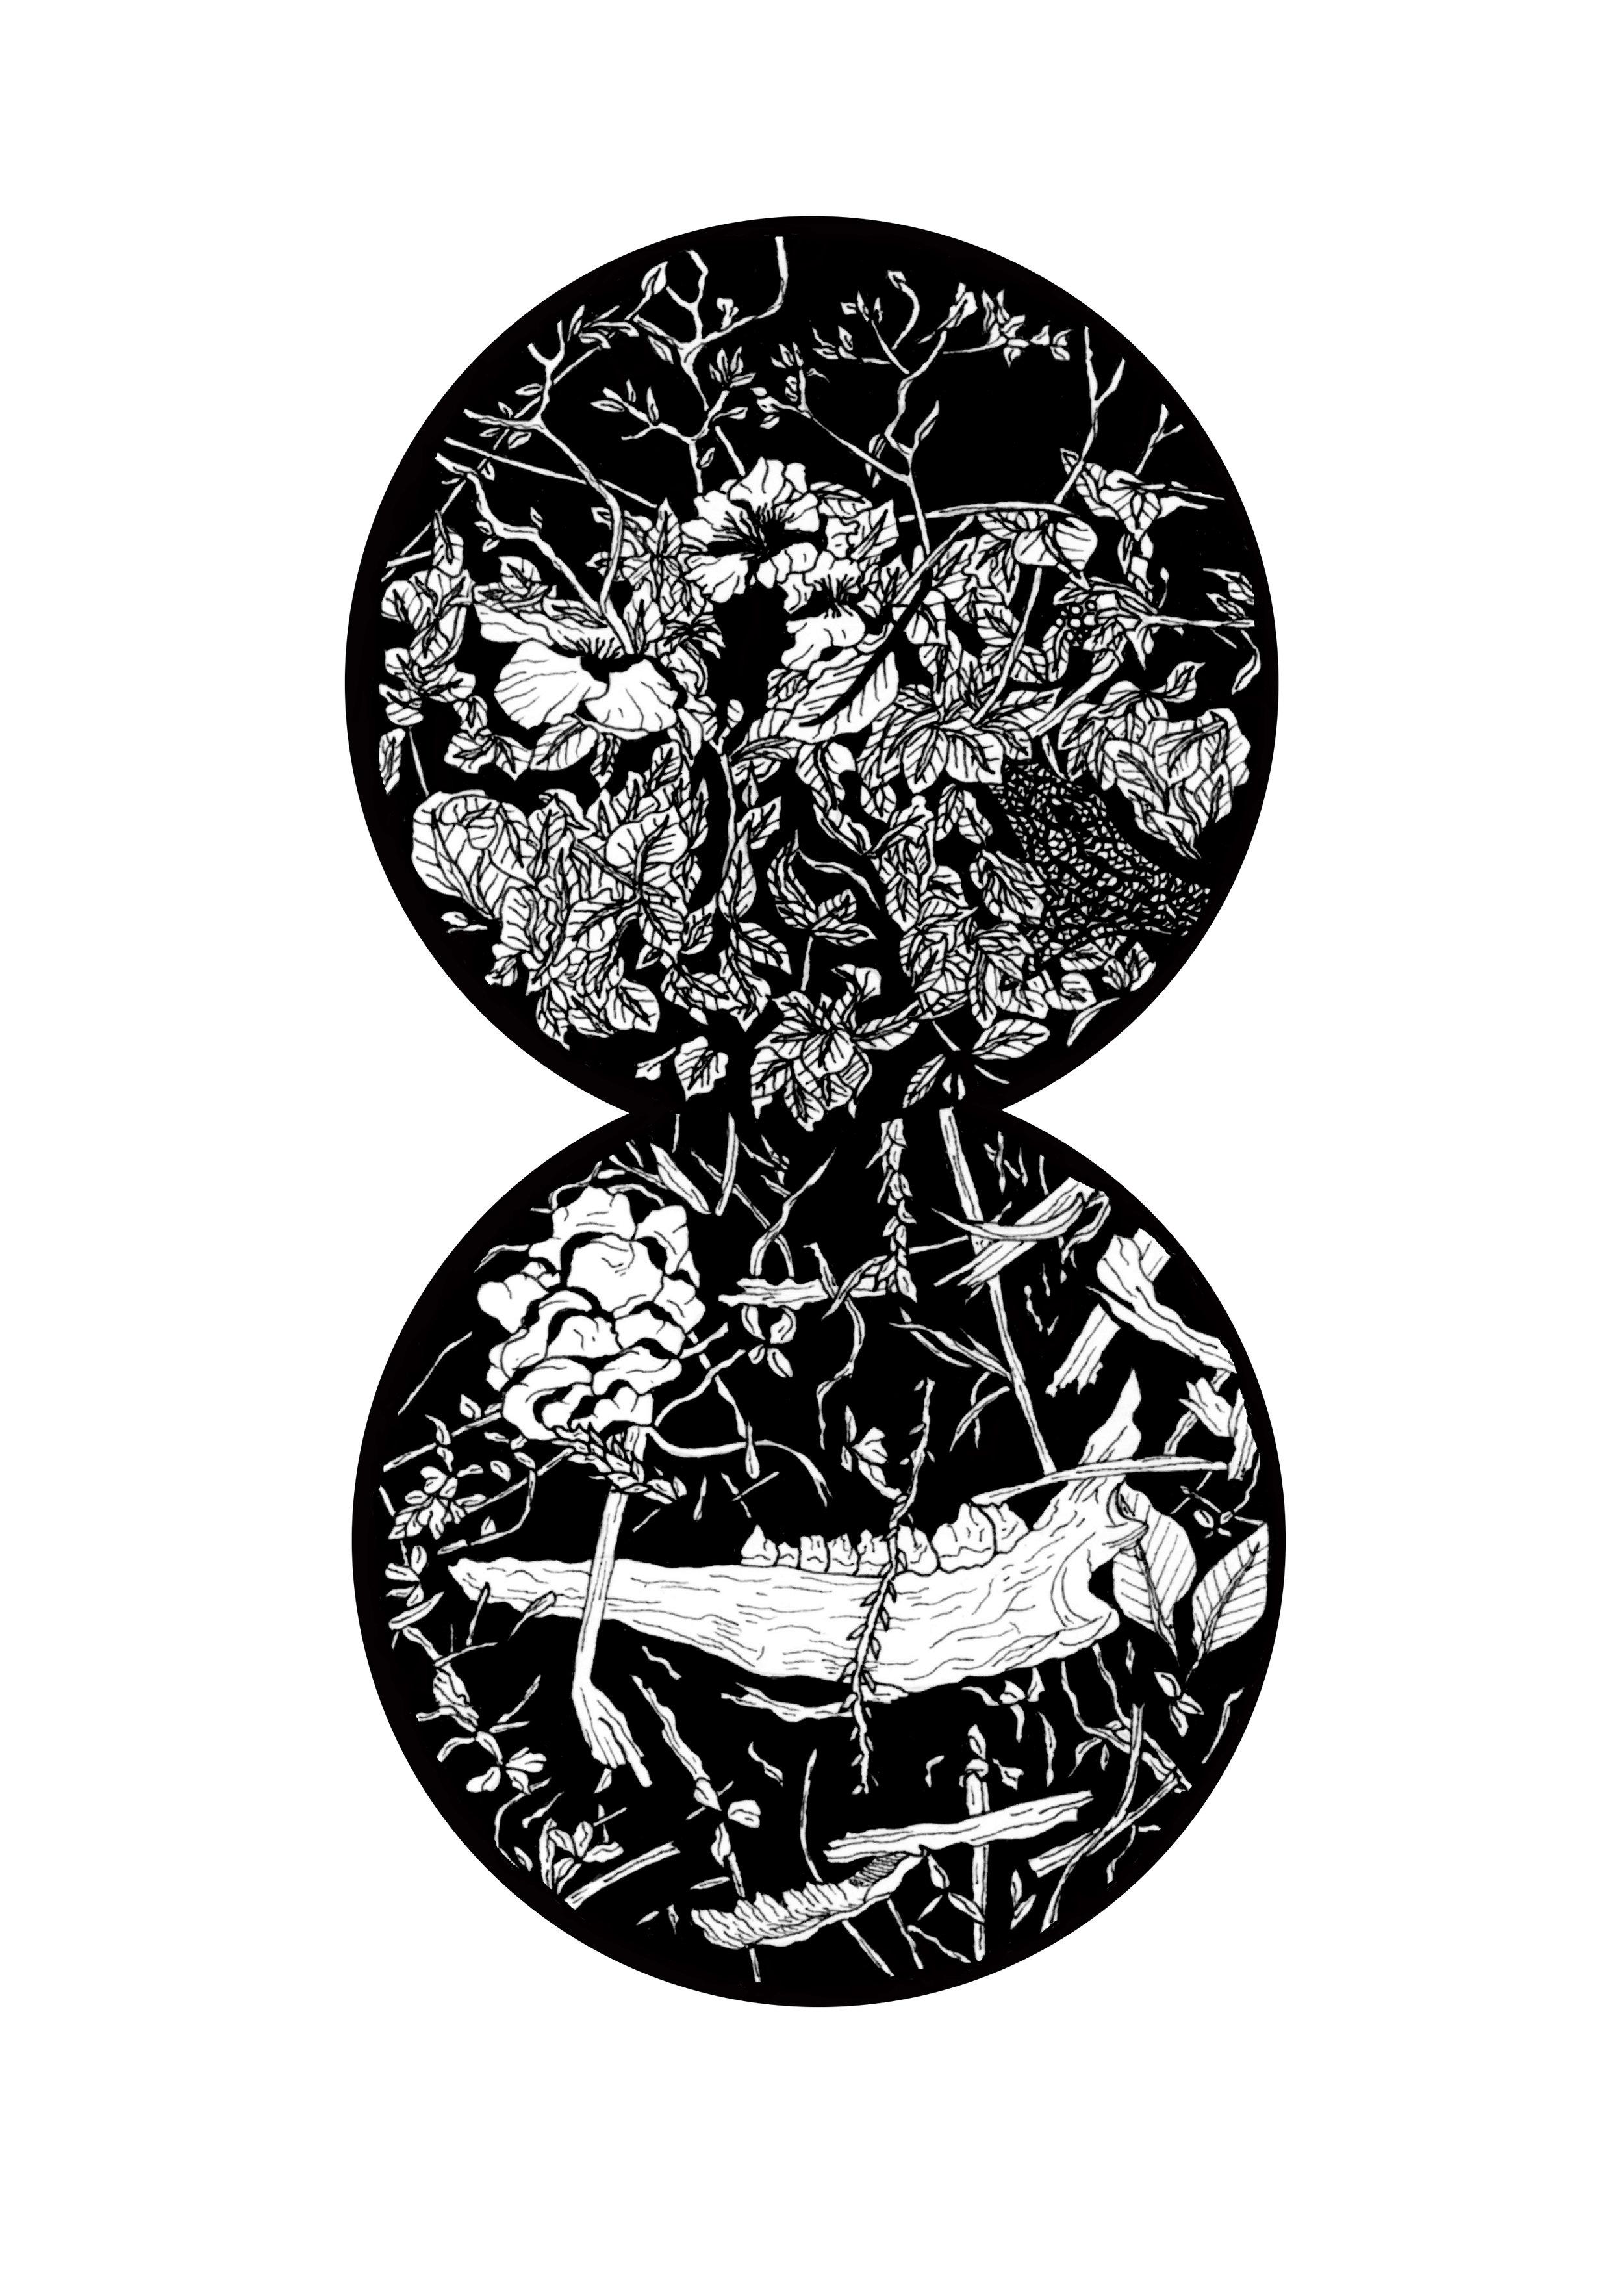 We Were Here: Snake/Mandible | NATALIE VESTIN  Ink on paper, 4 1/2 x 6 in., 2016